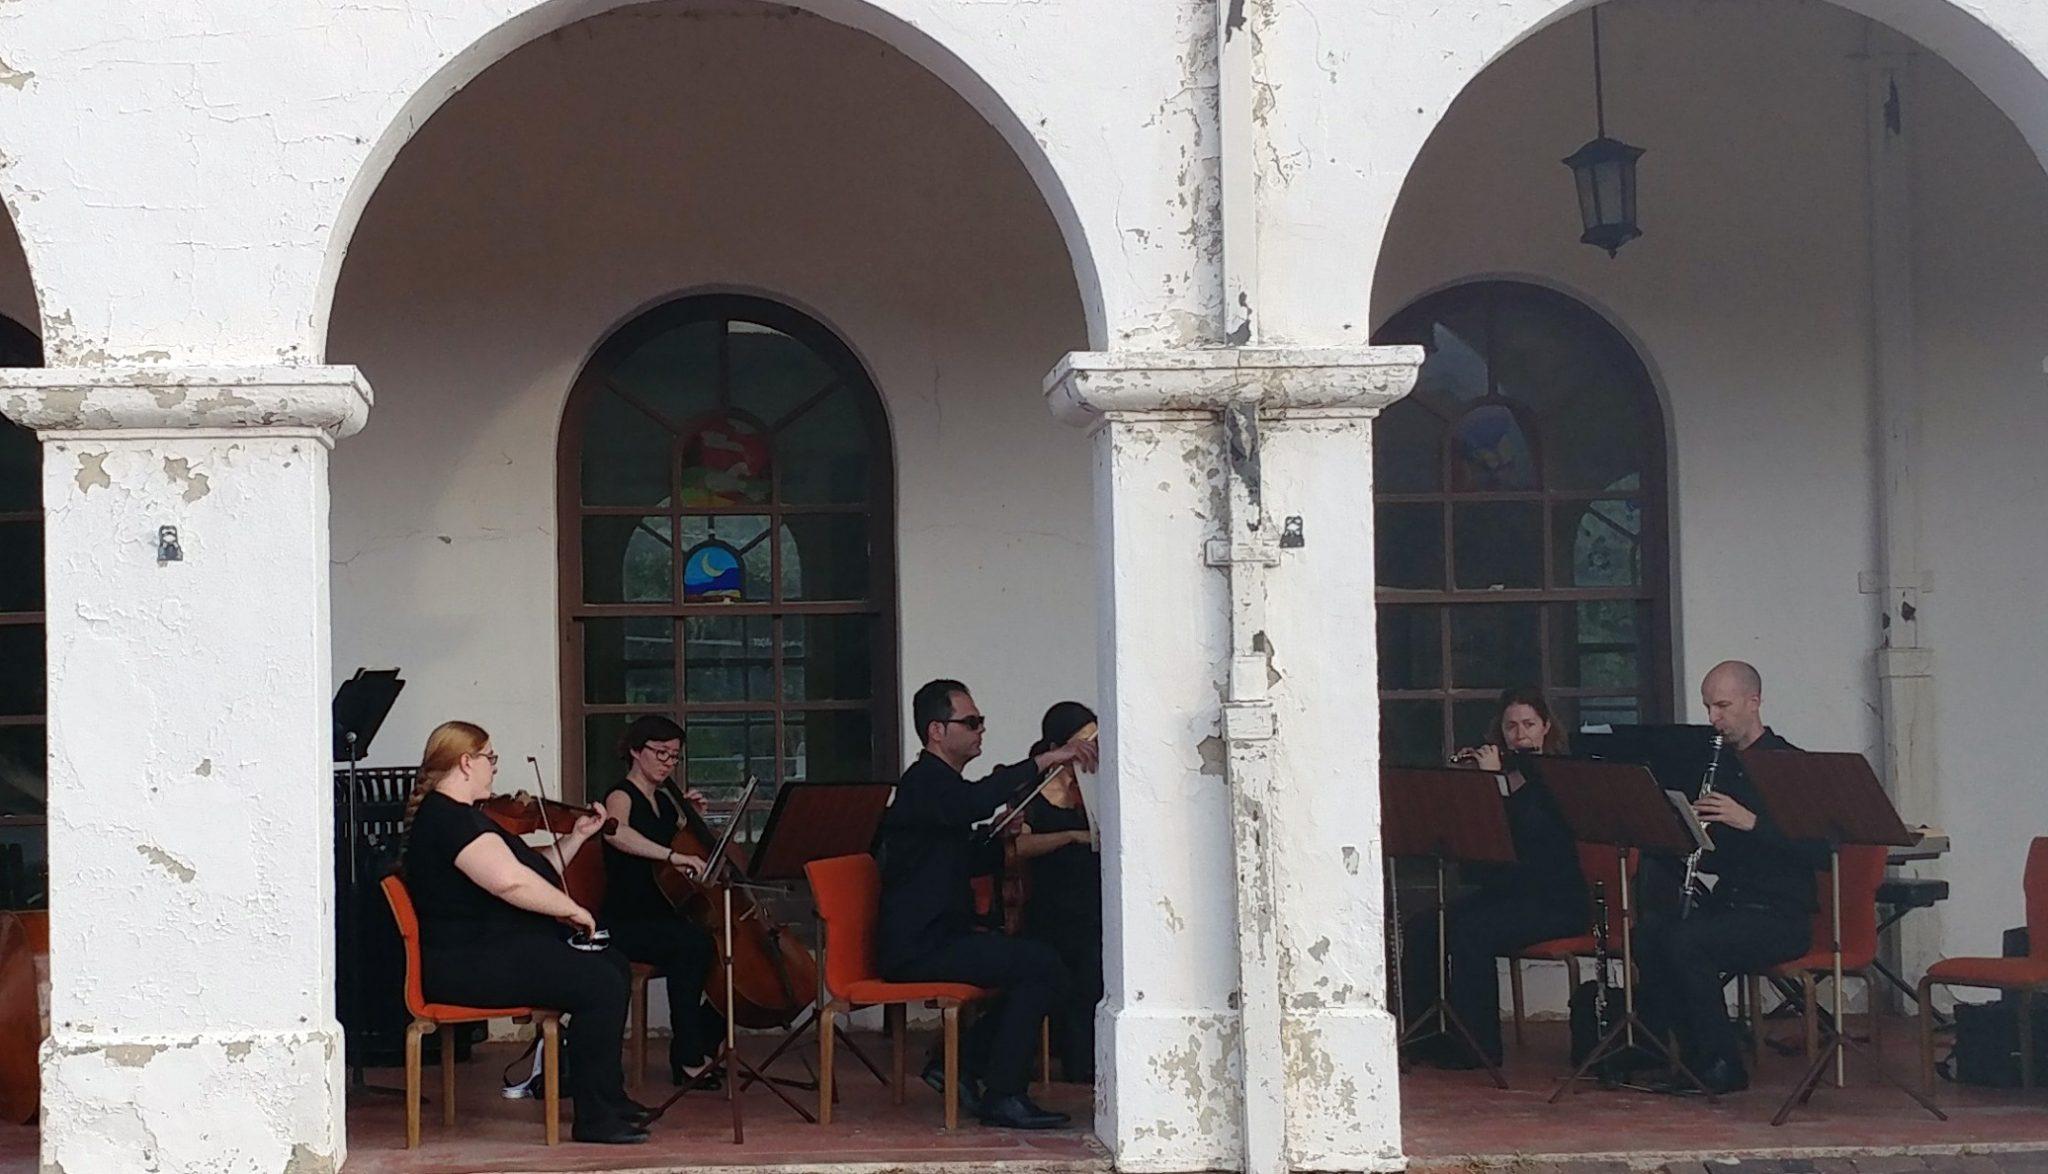 Orchestra Plays at Depot